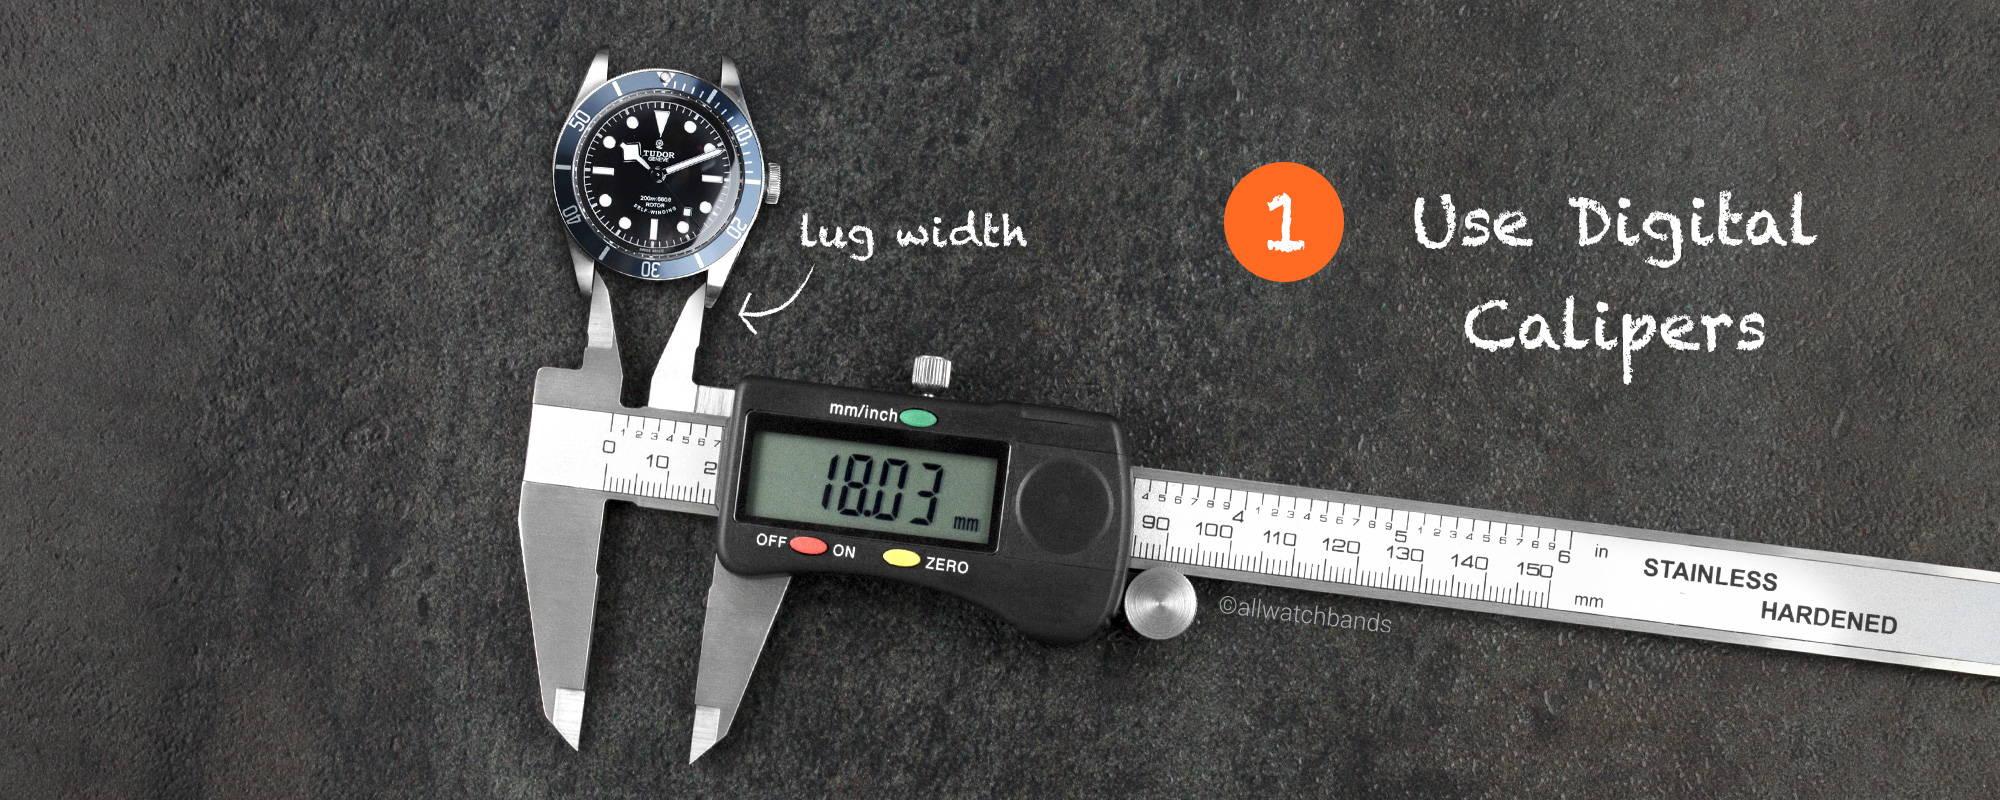 use digital calipers to measure watch band length